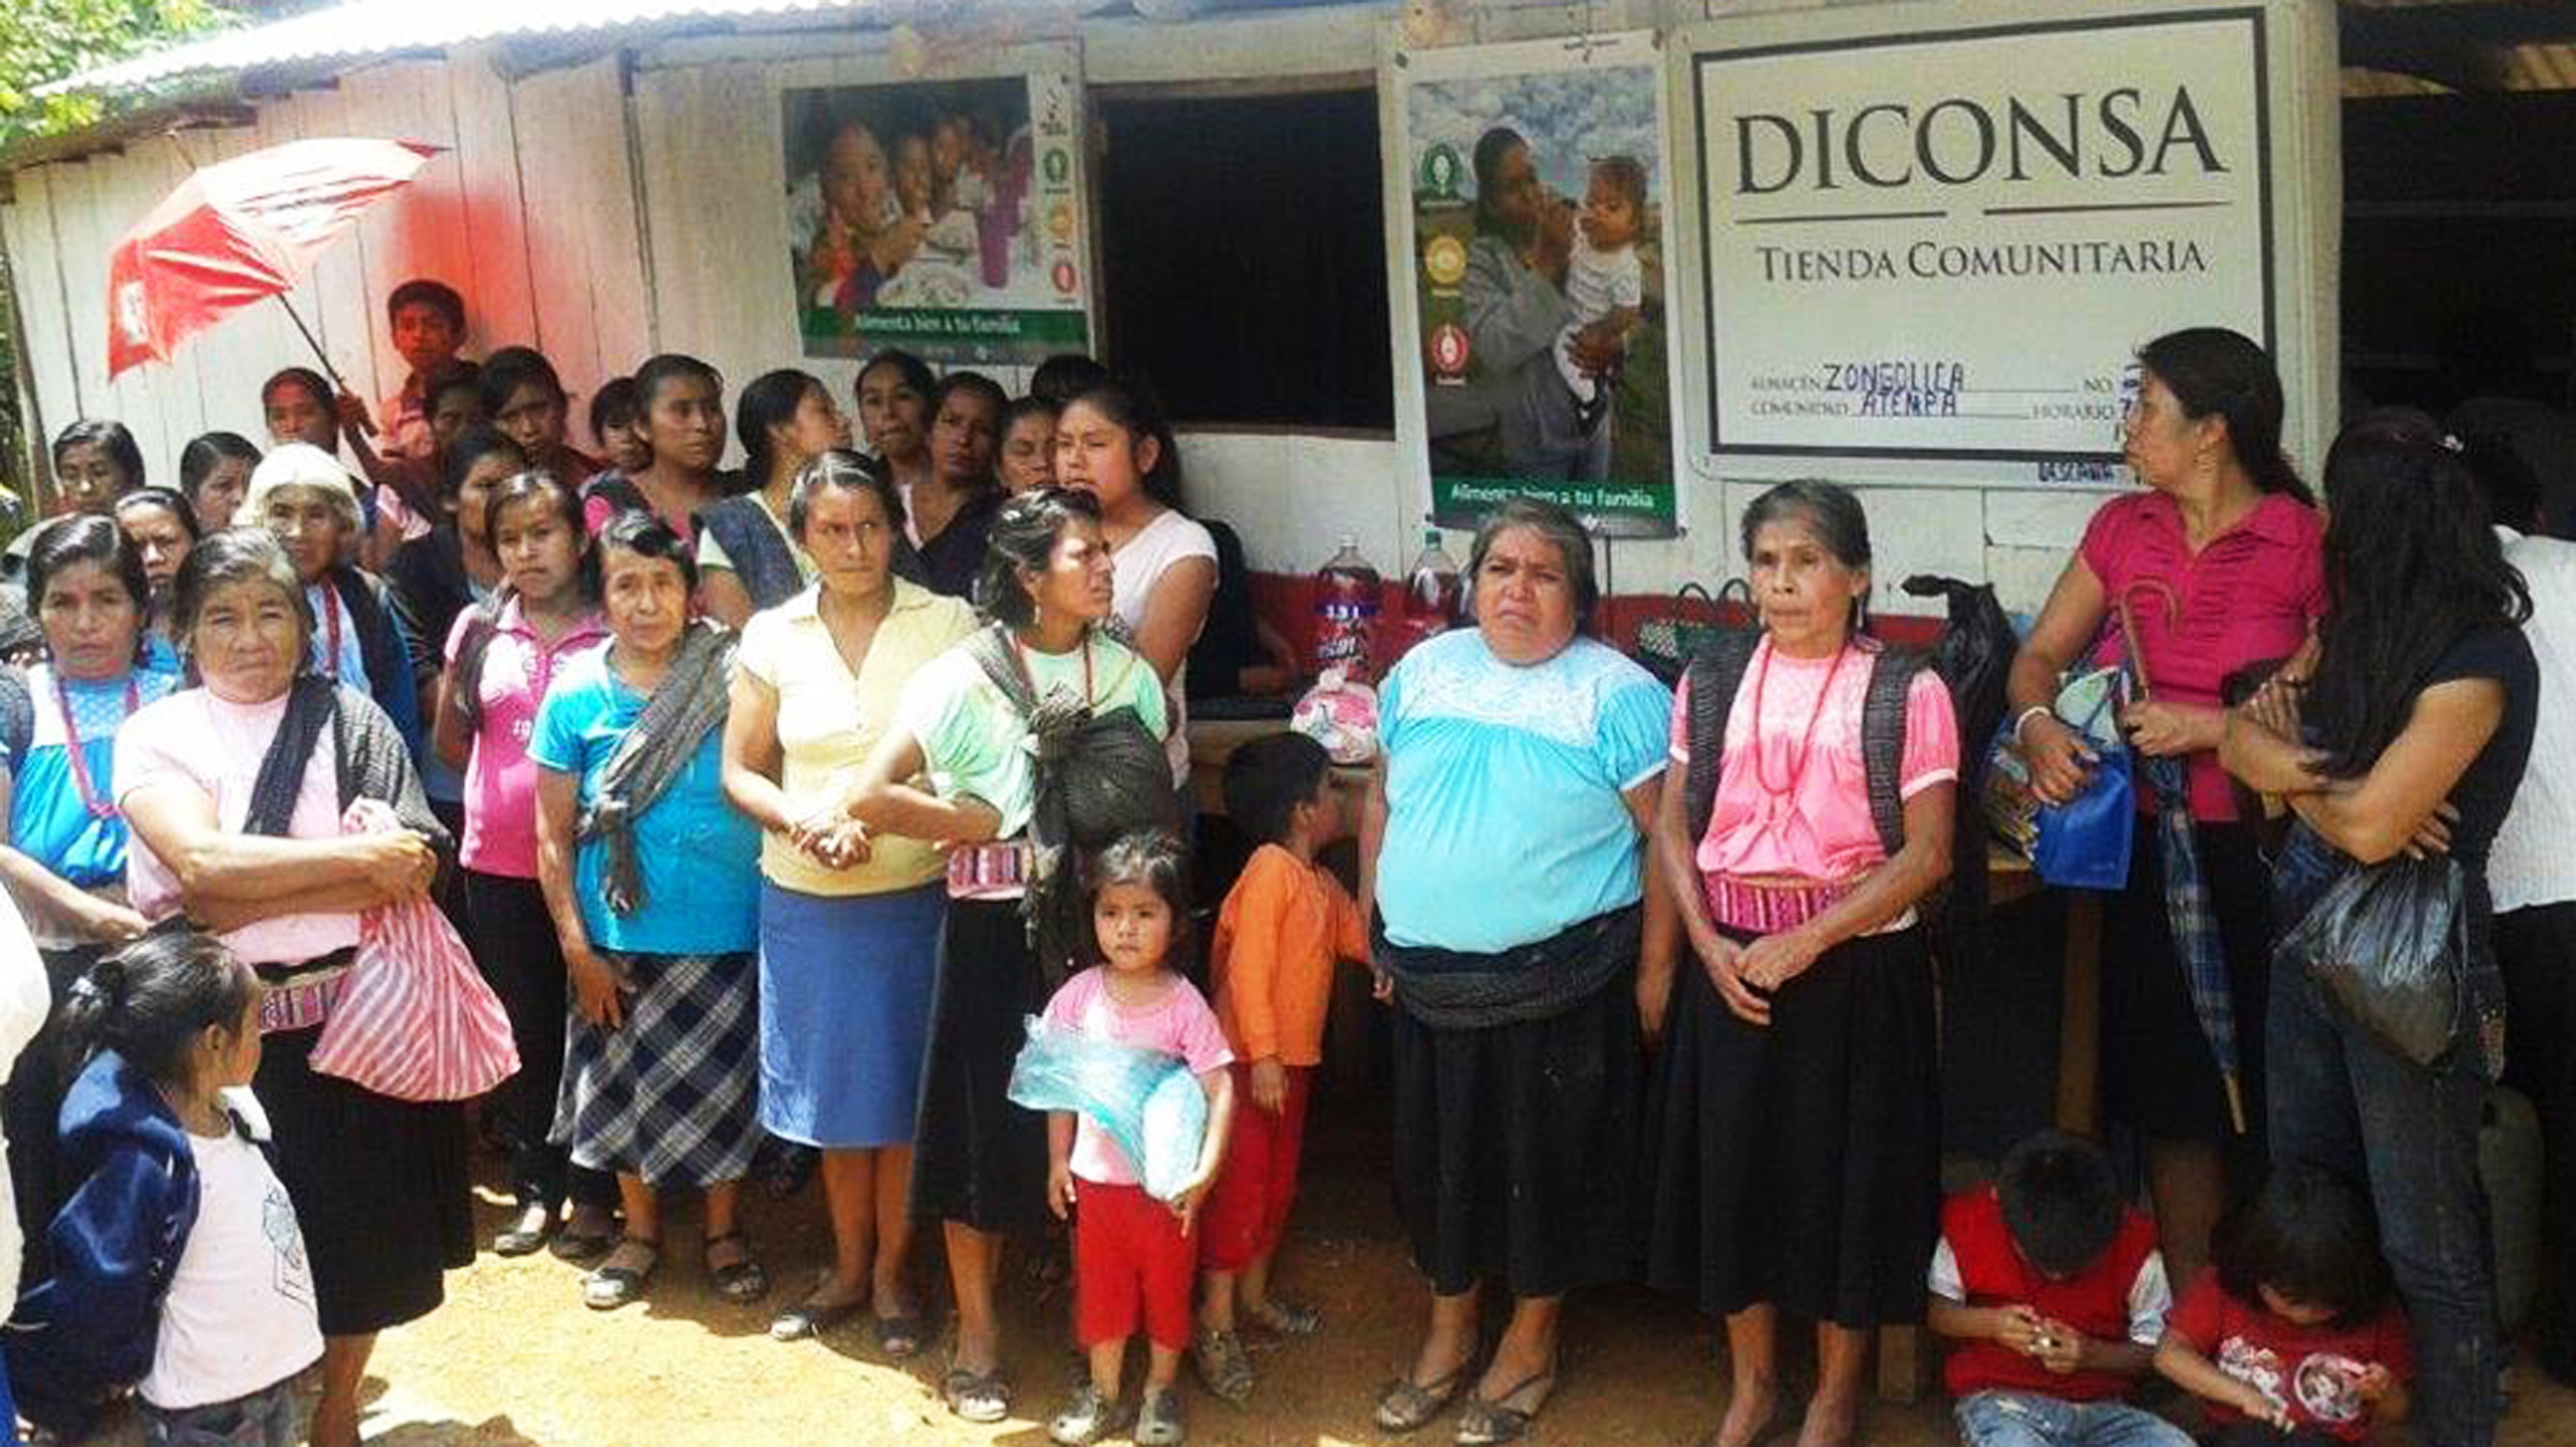 Inaugura Diconsa 11 tiendas comunitarias en zona serrana de Veracruz